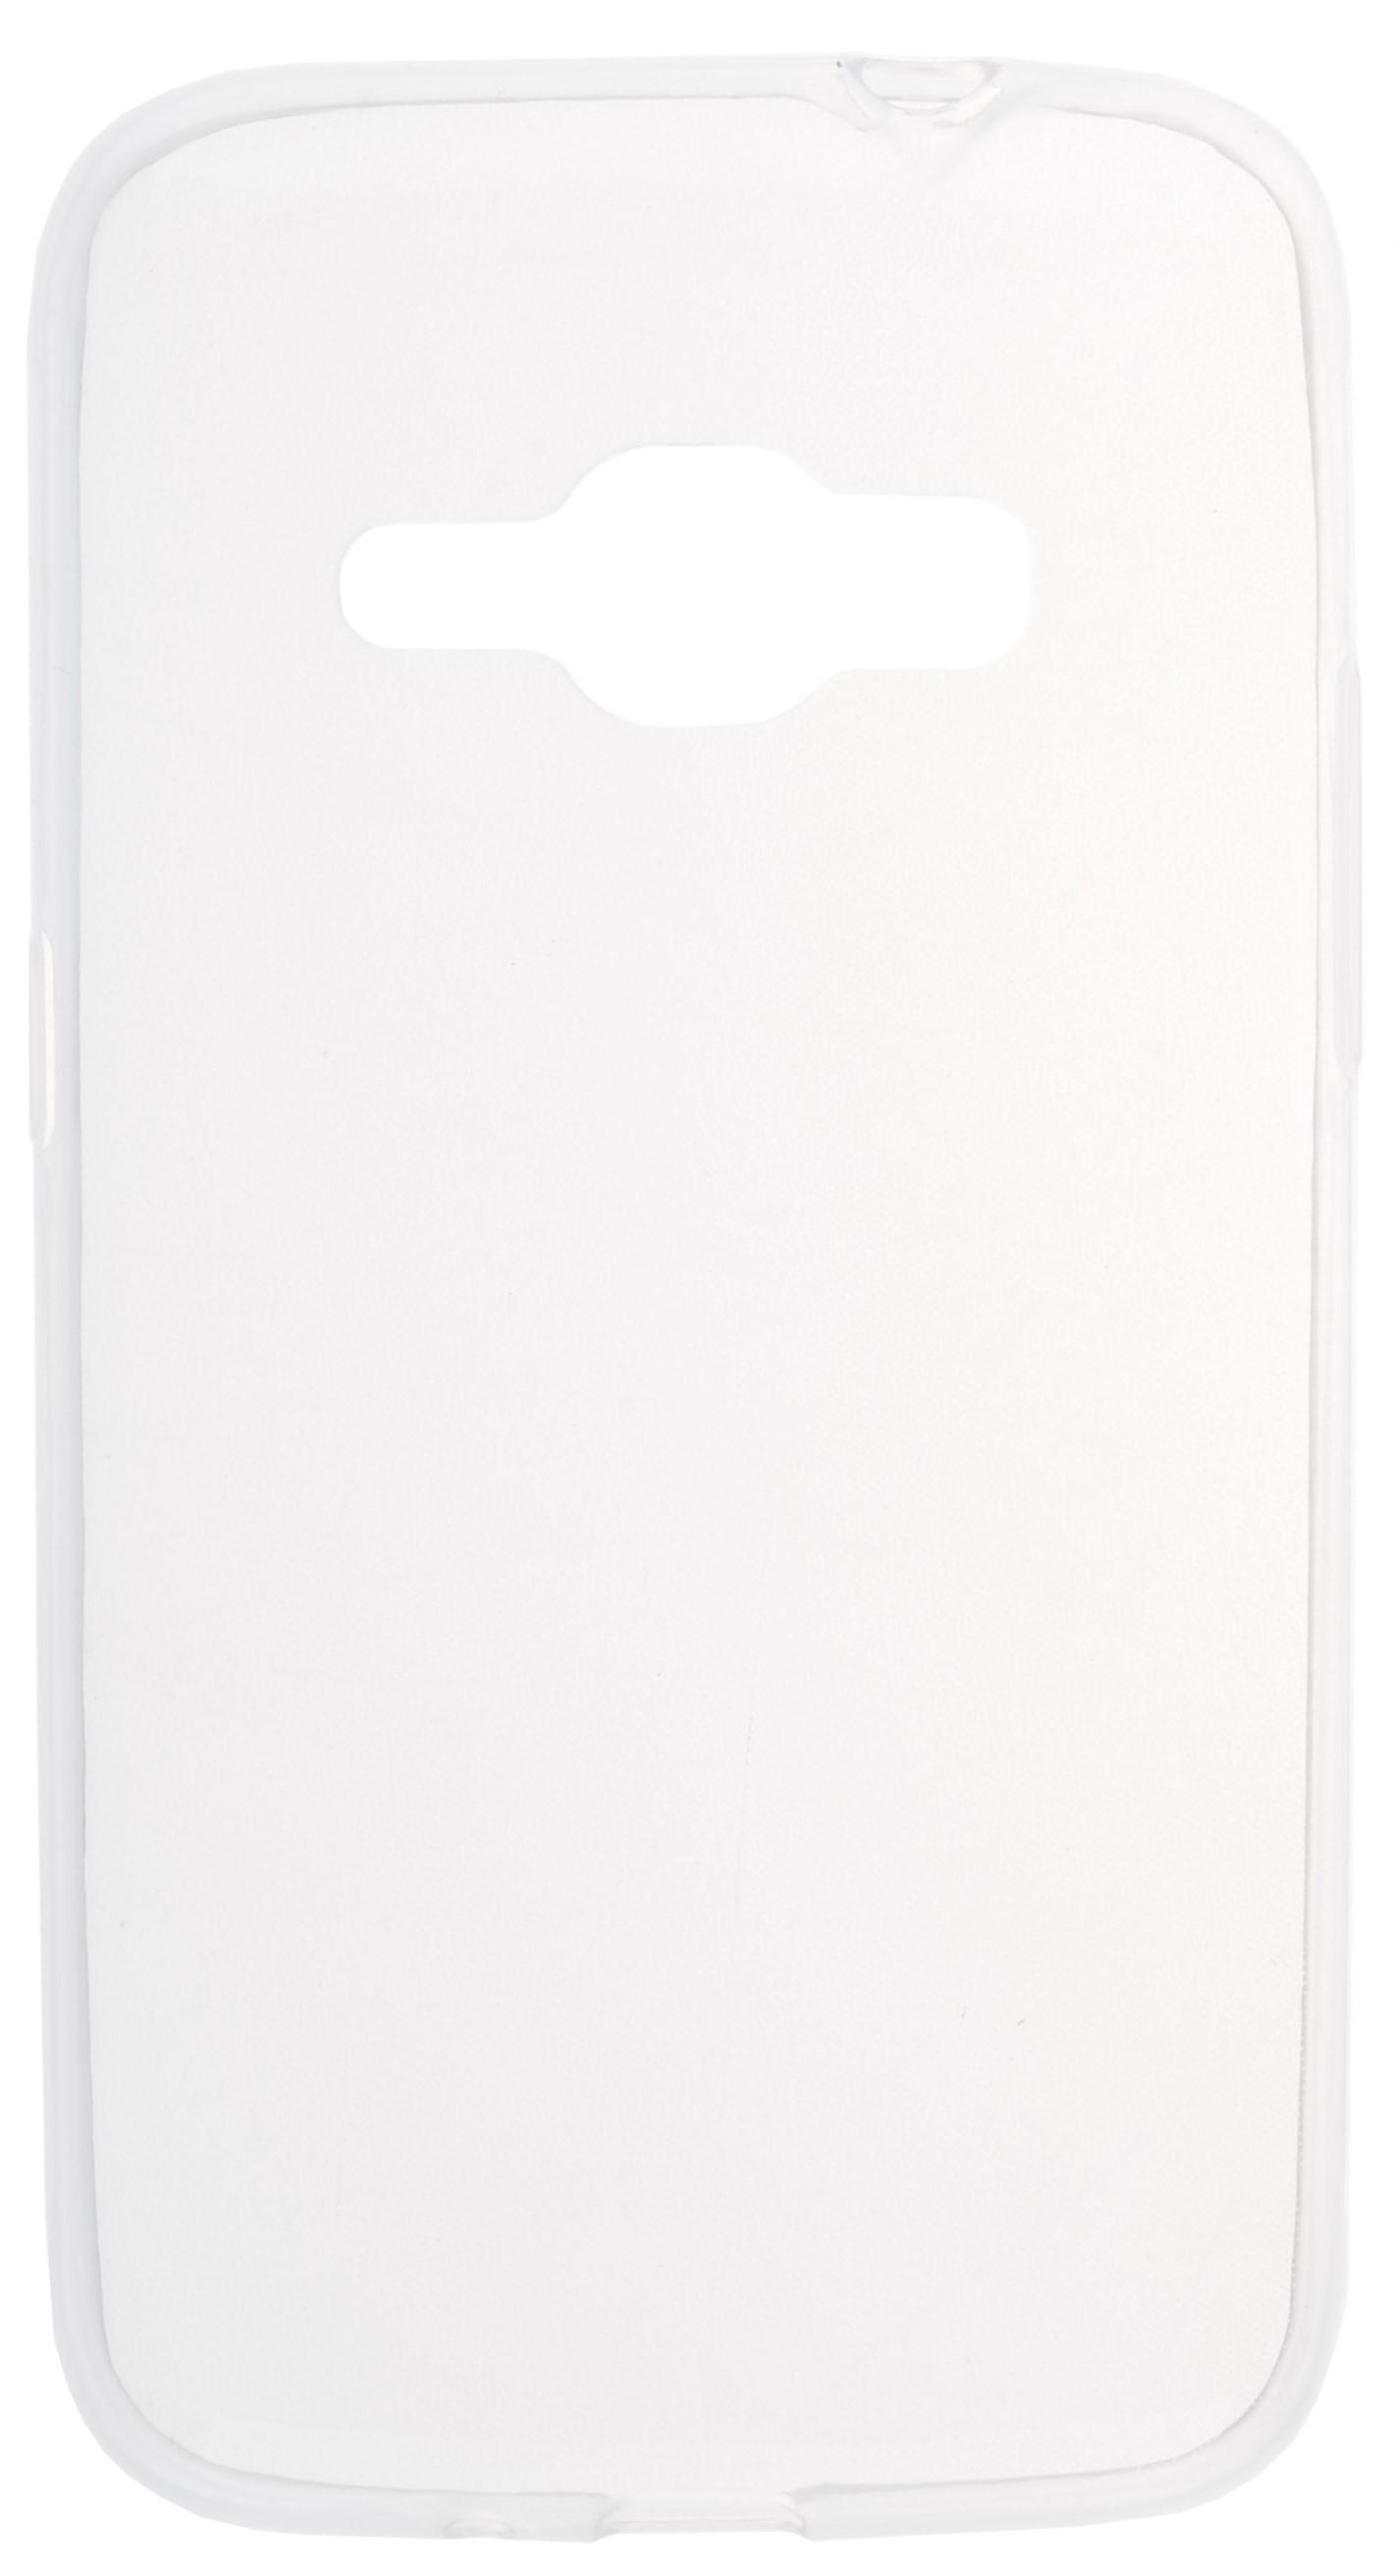 Чехол для сотового телефона skinBOX Slim Silicone, 4660041407372, прозрачный чехол для сотового телефона skinbox slim silicone 4660041408157 прозрачный